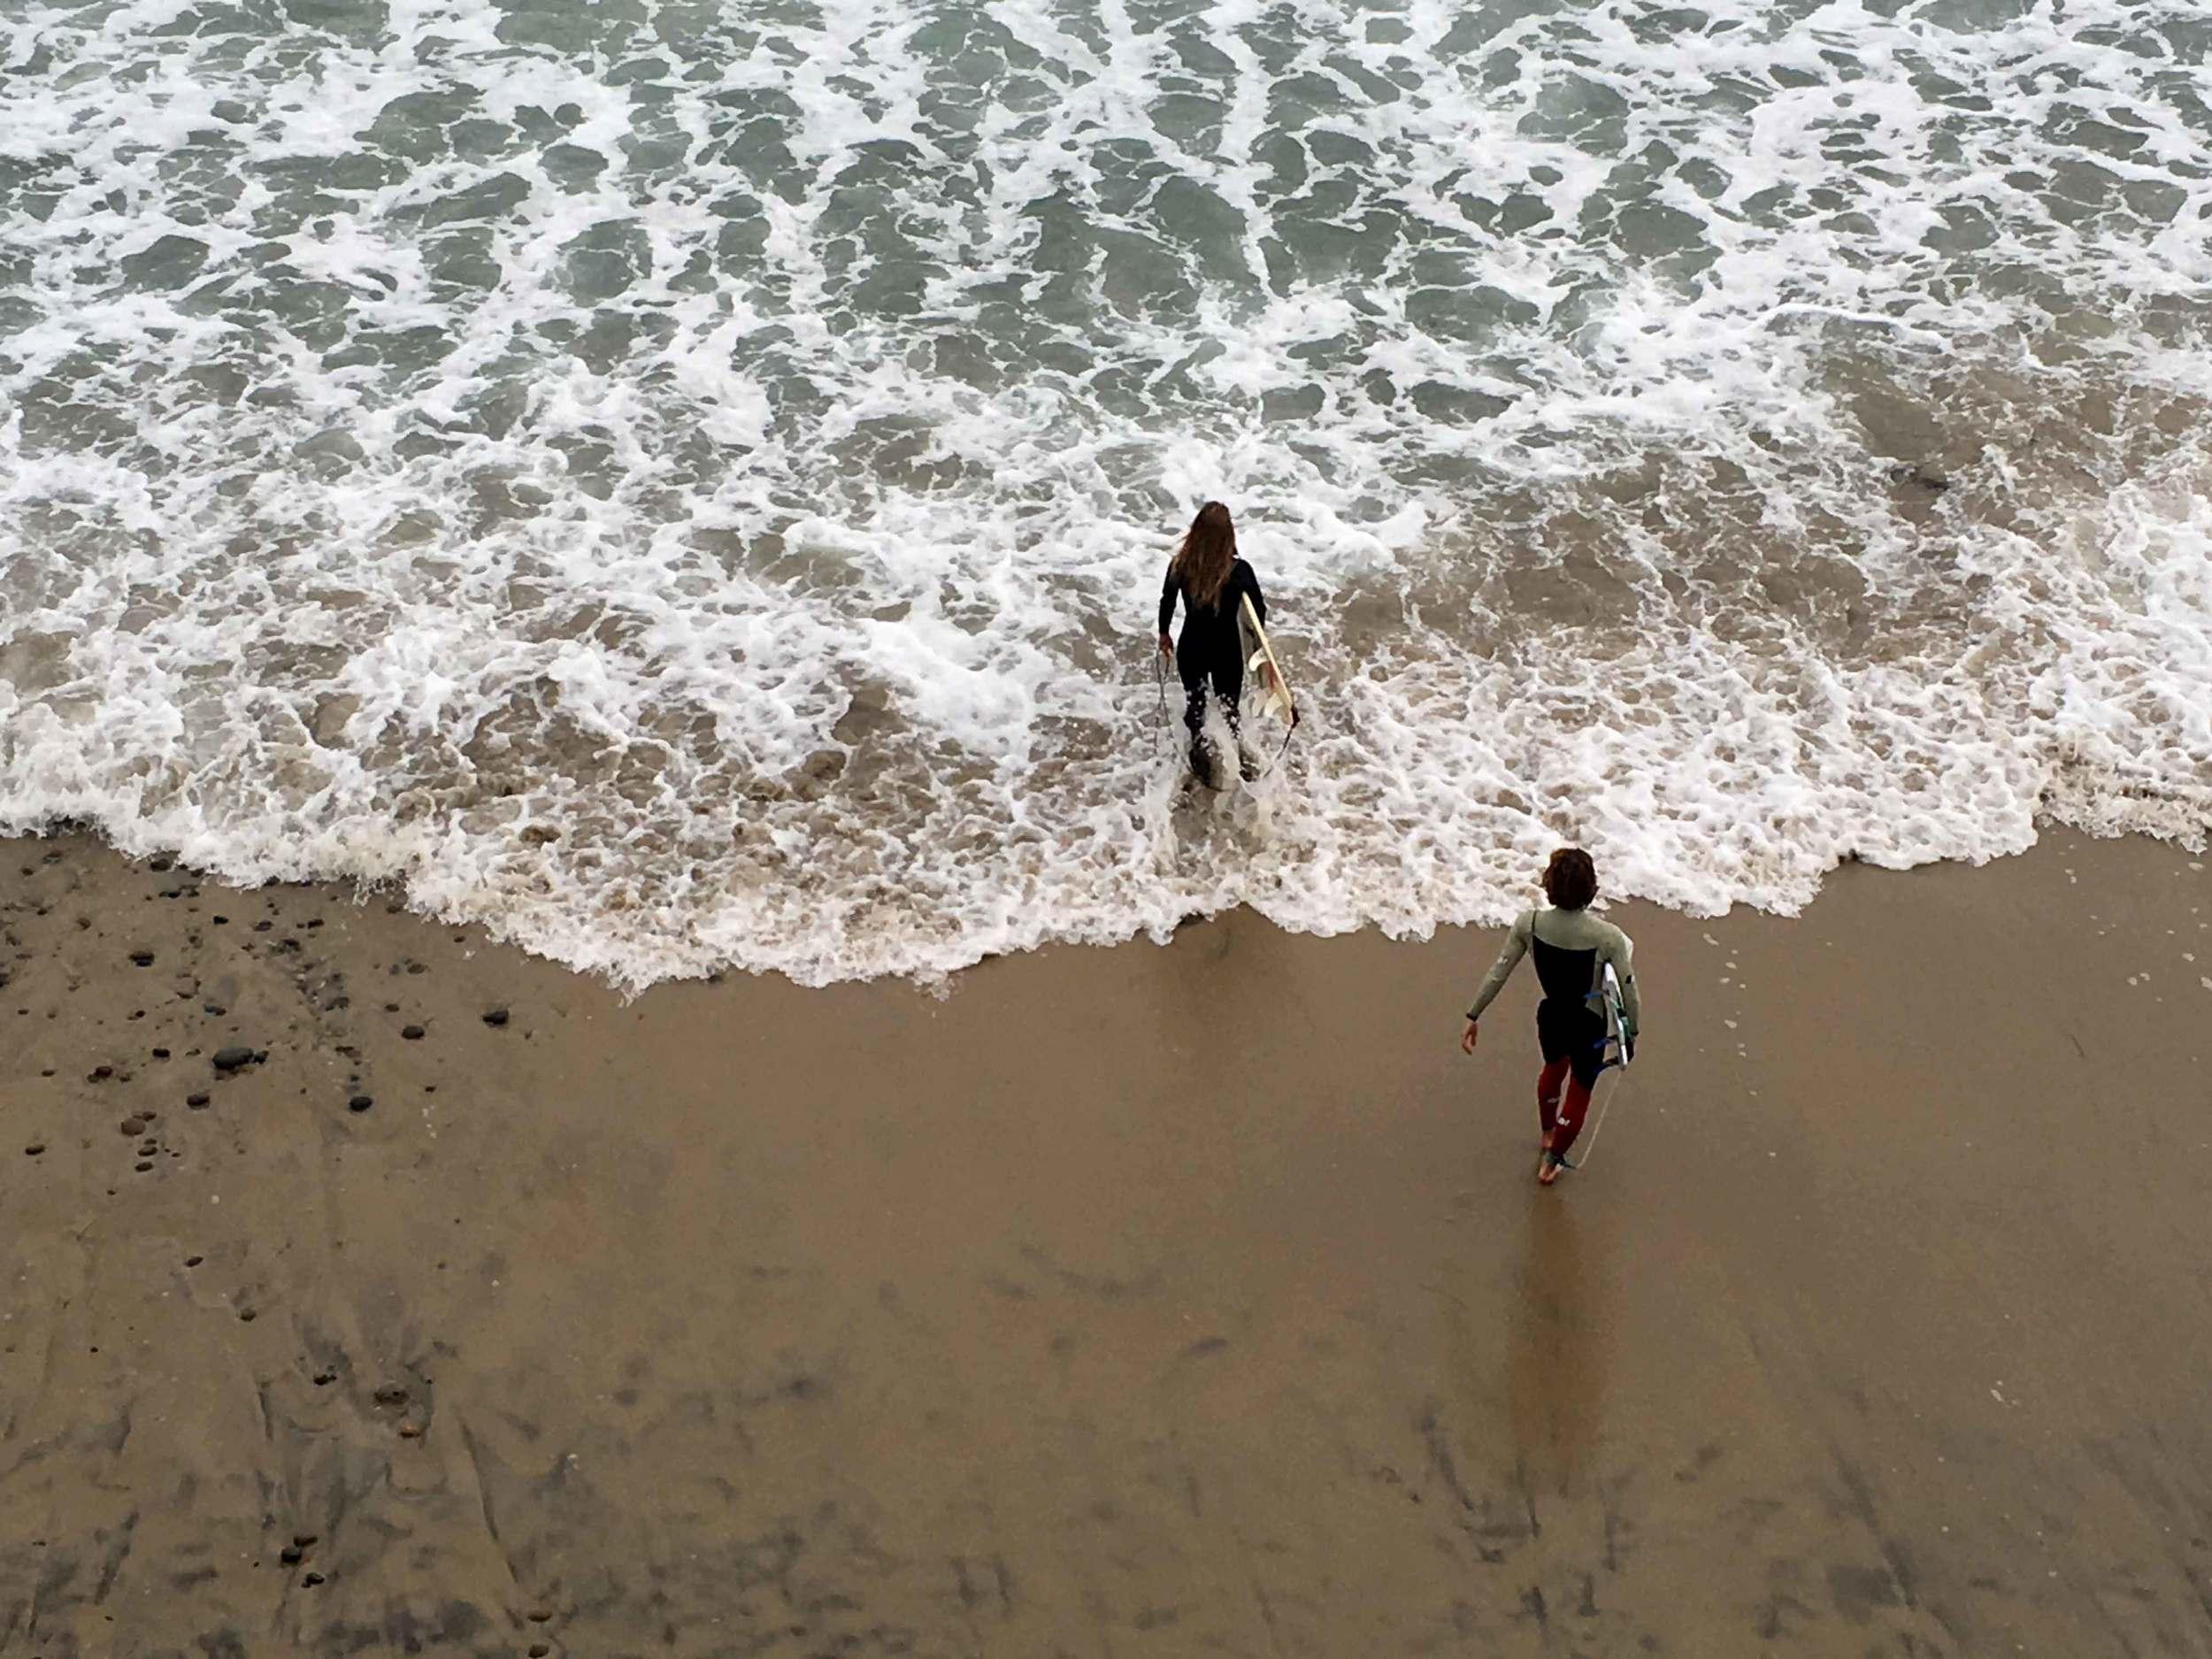 Surfers walking into the ocean, Swamis beach, Encinitas, California. Image©sourcingstyle.com